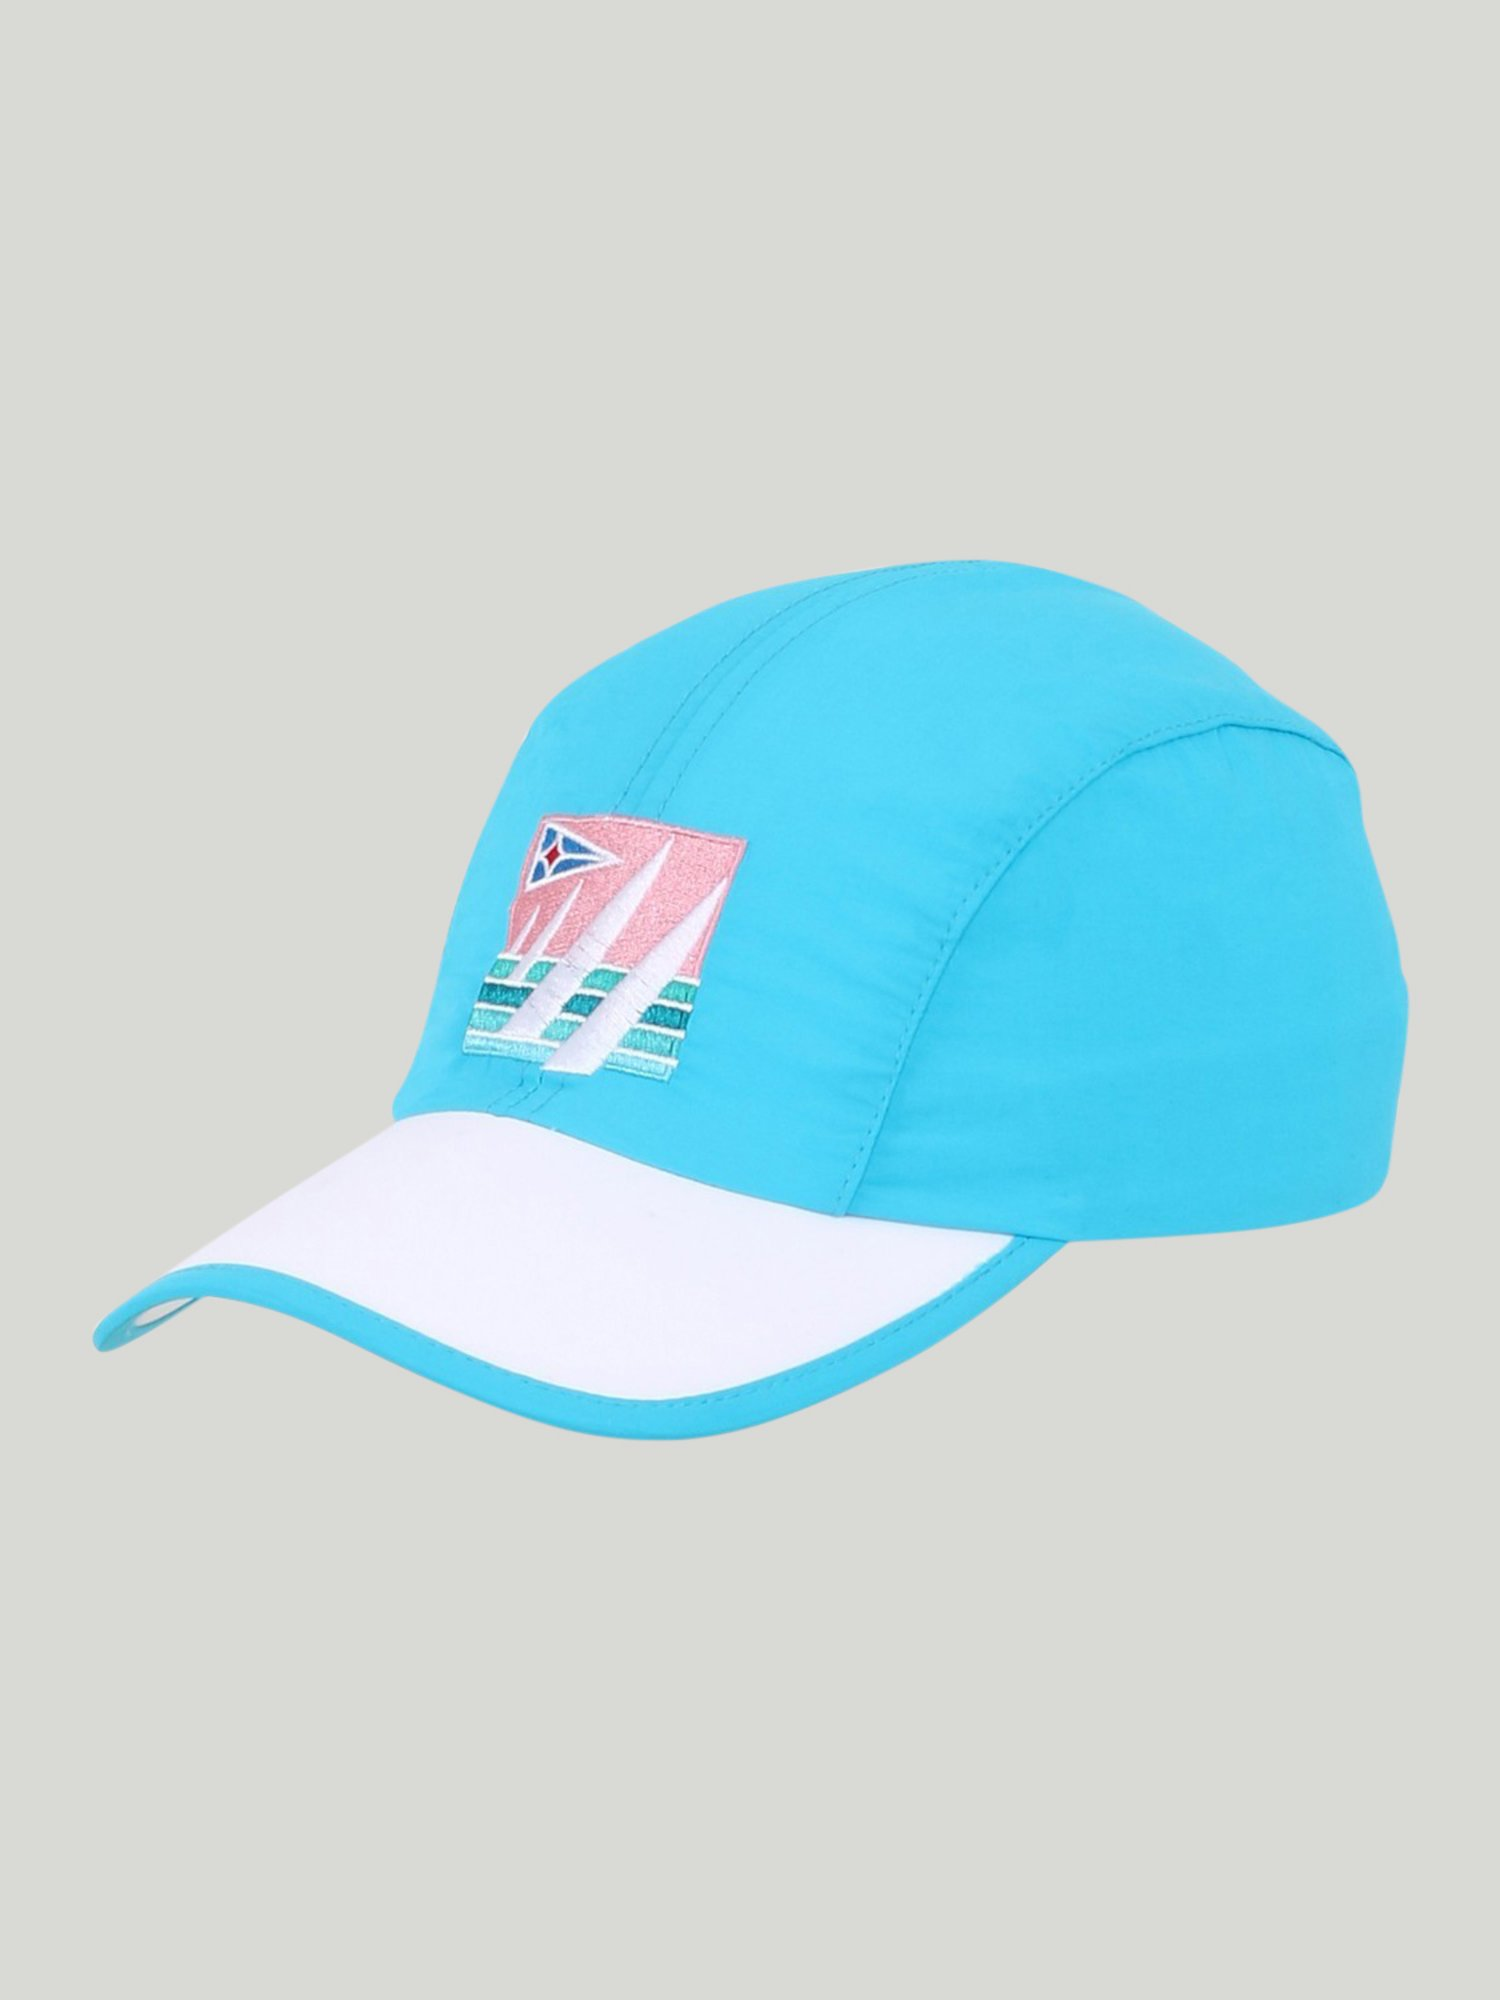 Cap Swan Cup - Azul Caribe